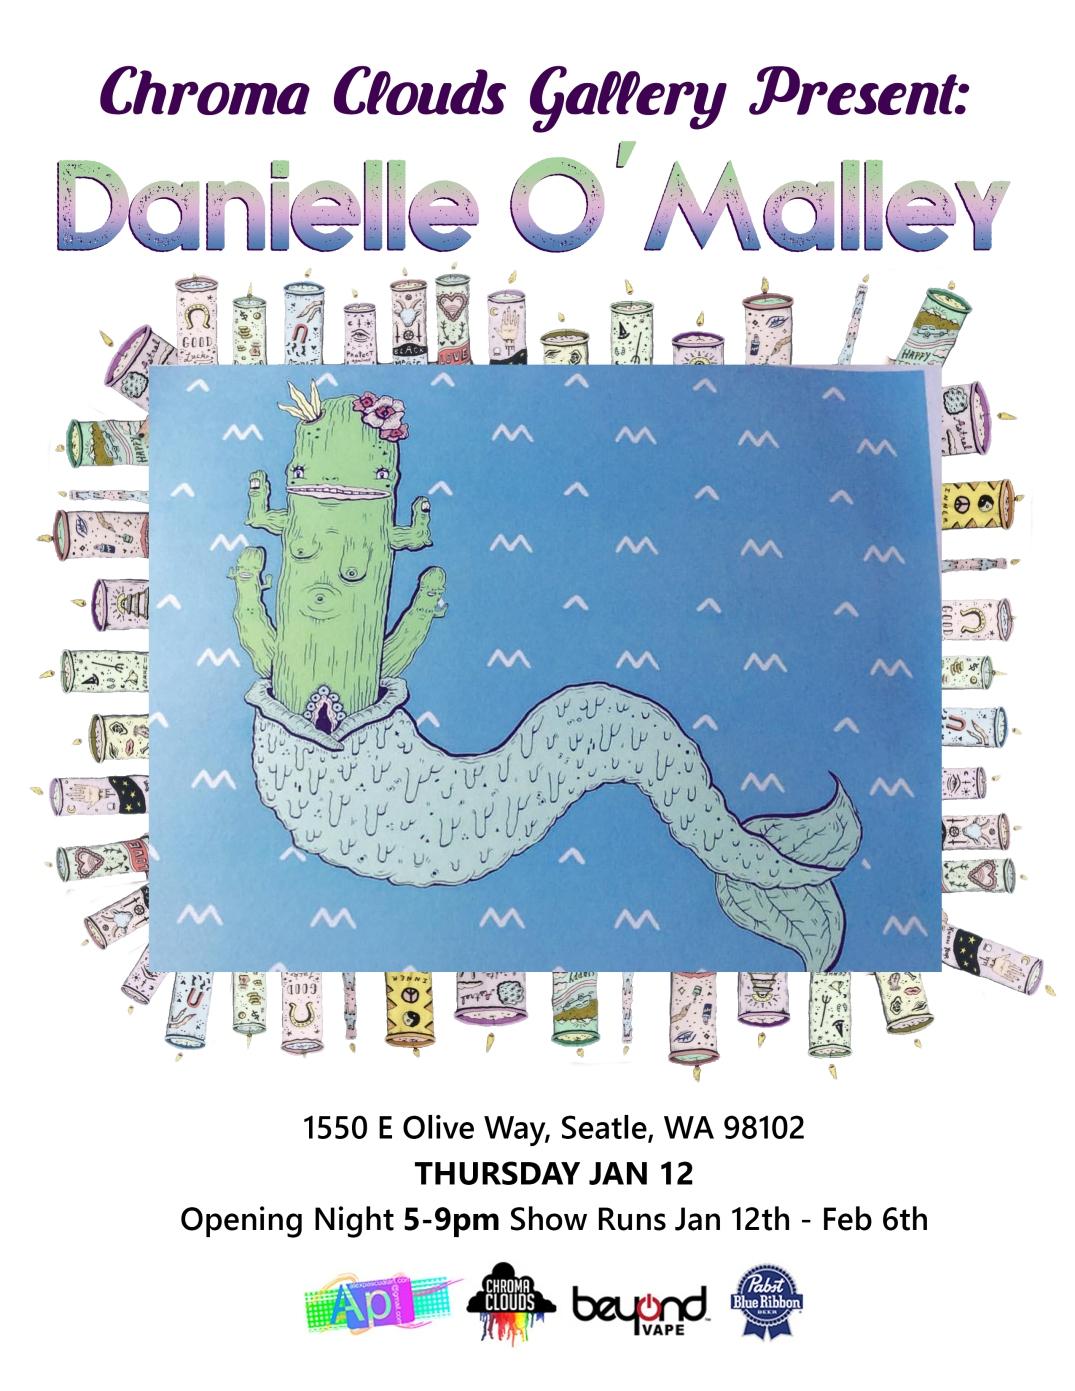 Danielle O'Malley final (2).jpg